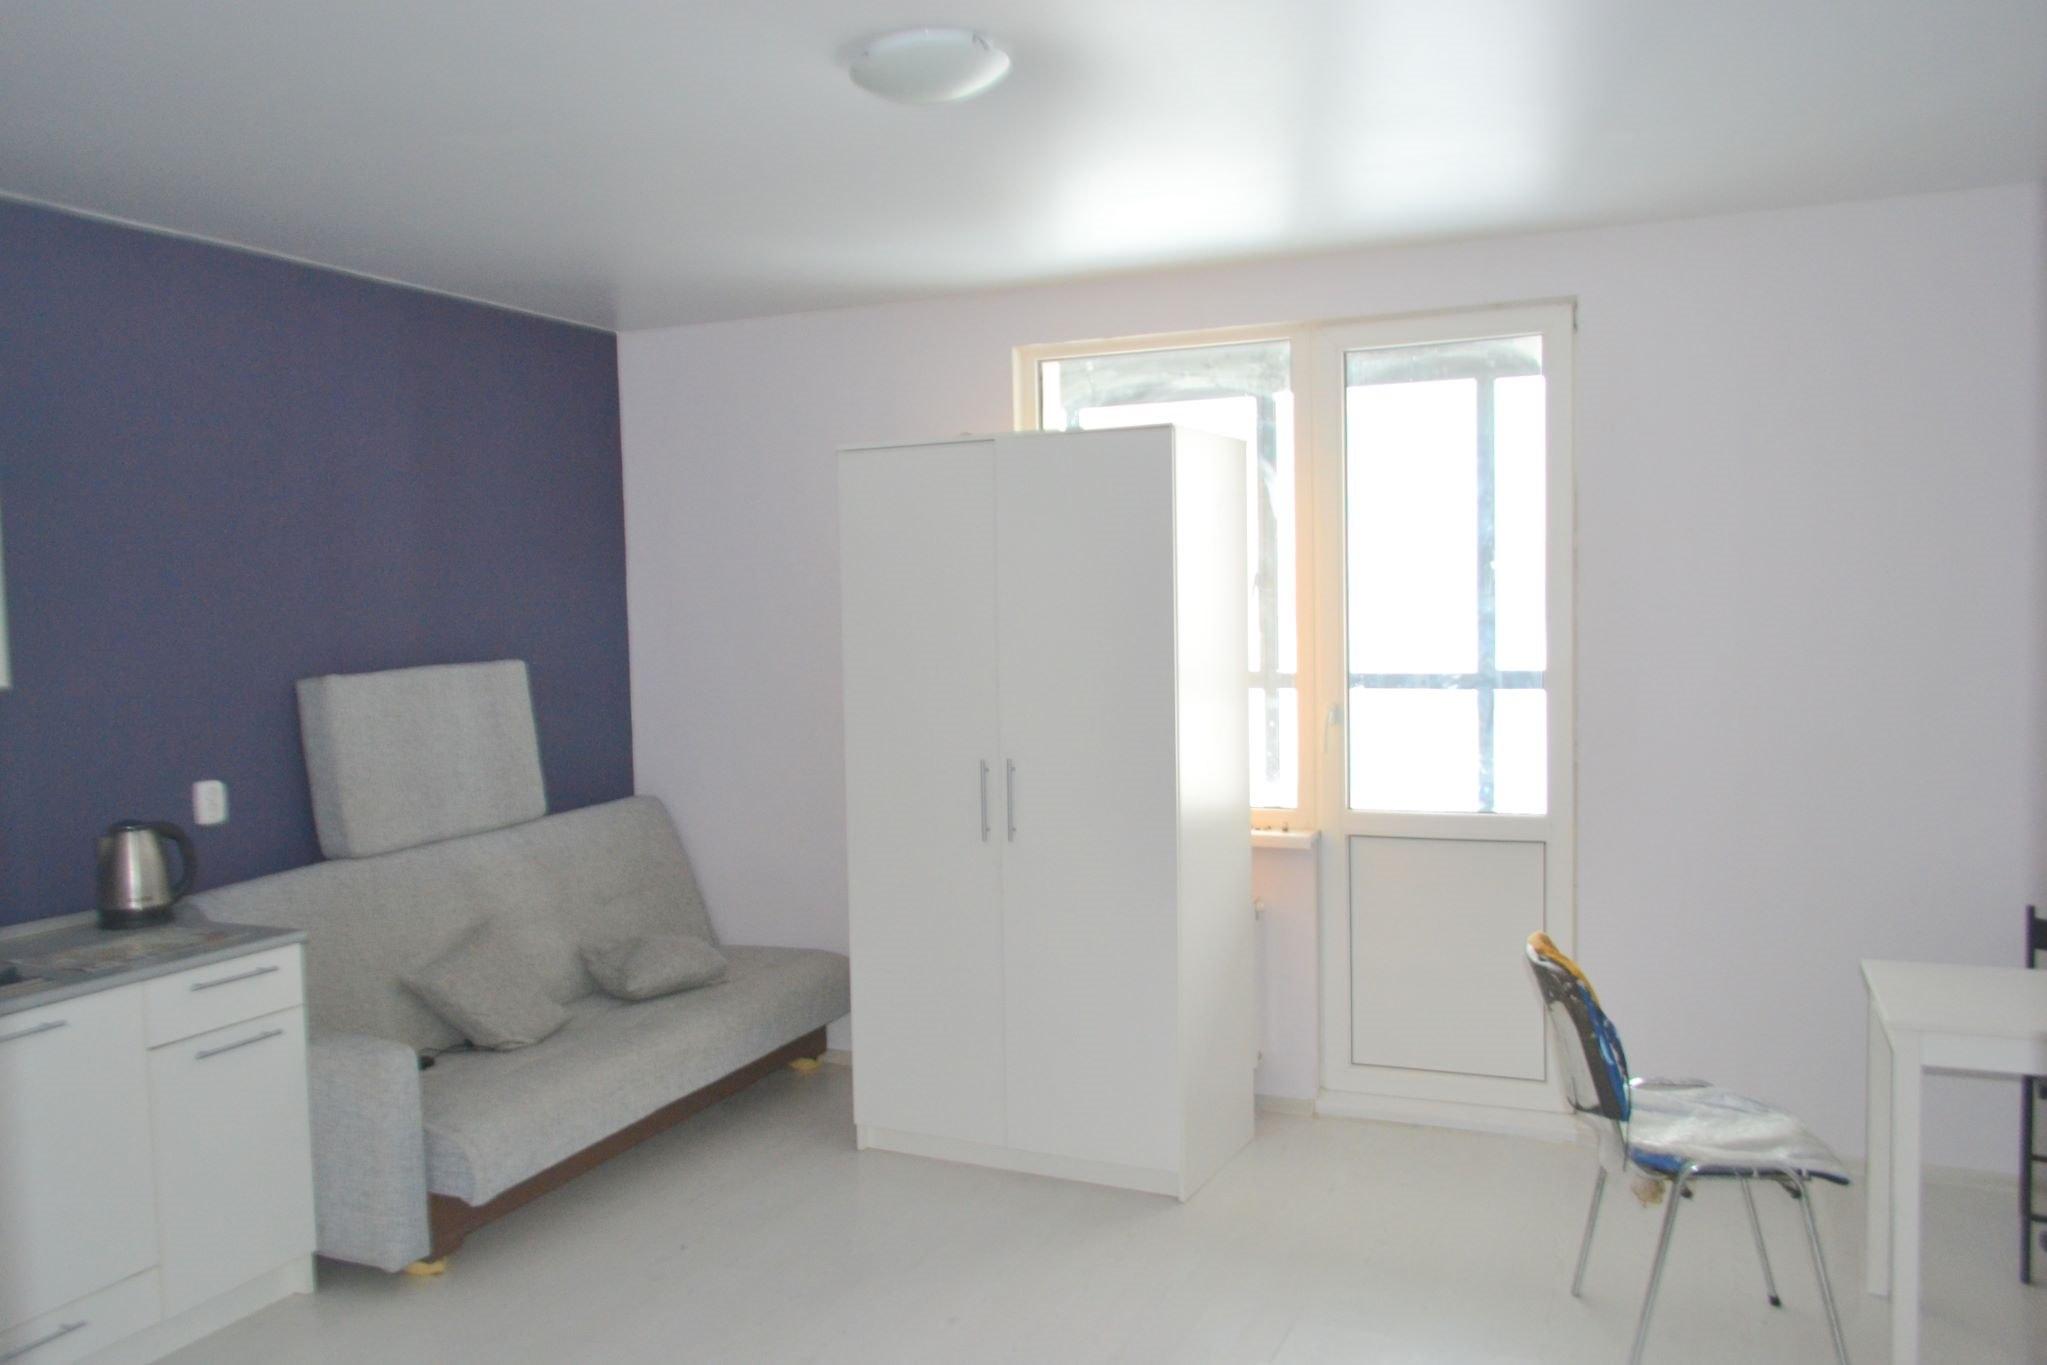 Продажа квартир: Санкт-Петербург, ул. Вадима Шефнера, 10к1, фото 1